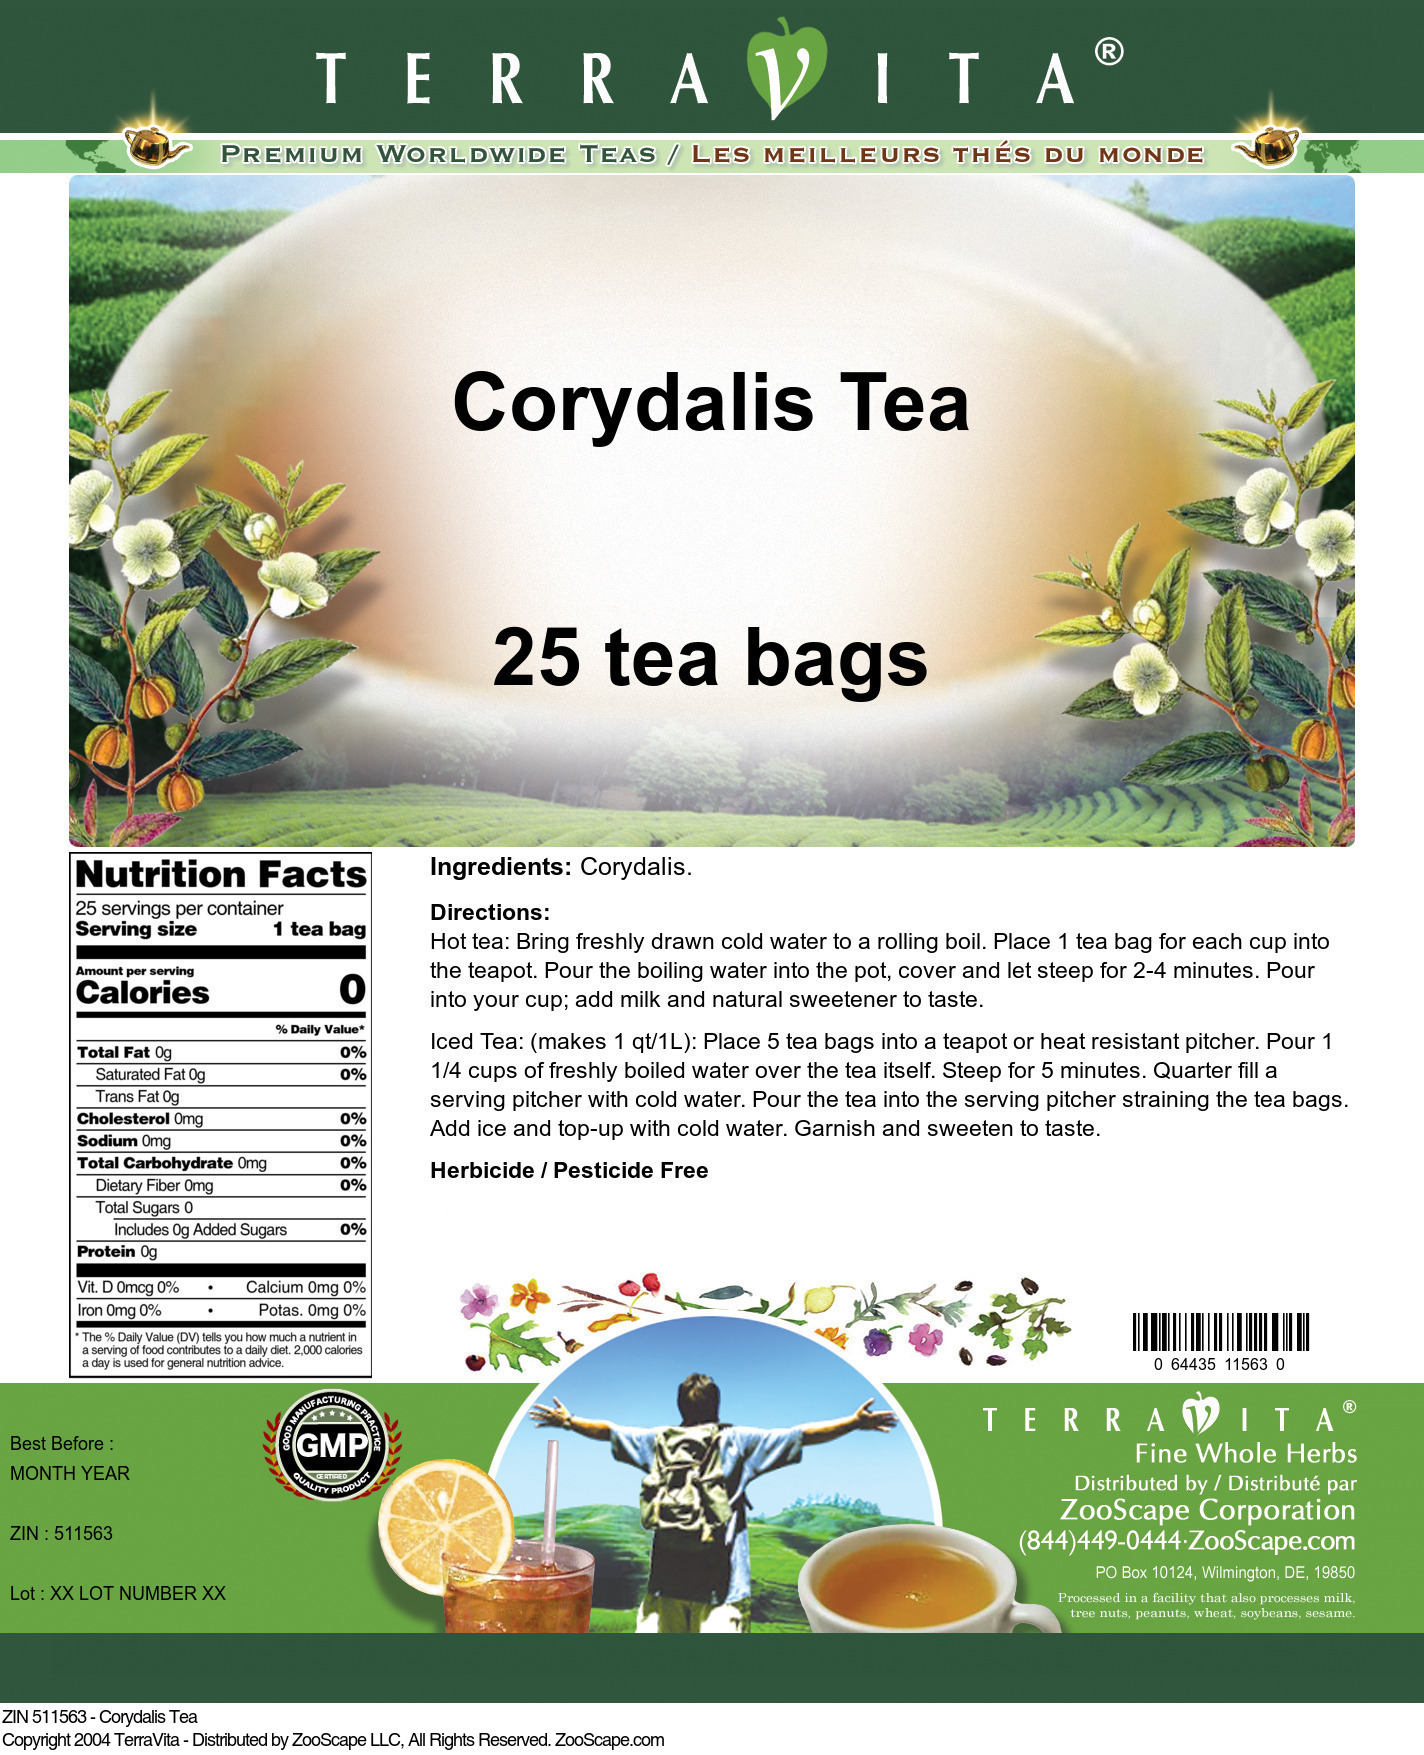 Corydalis Tea